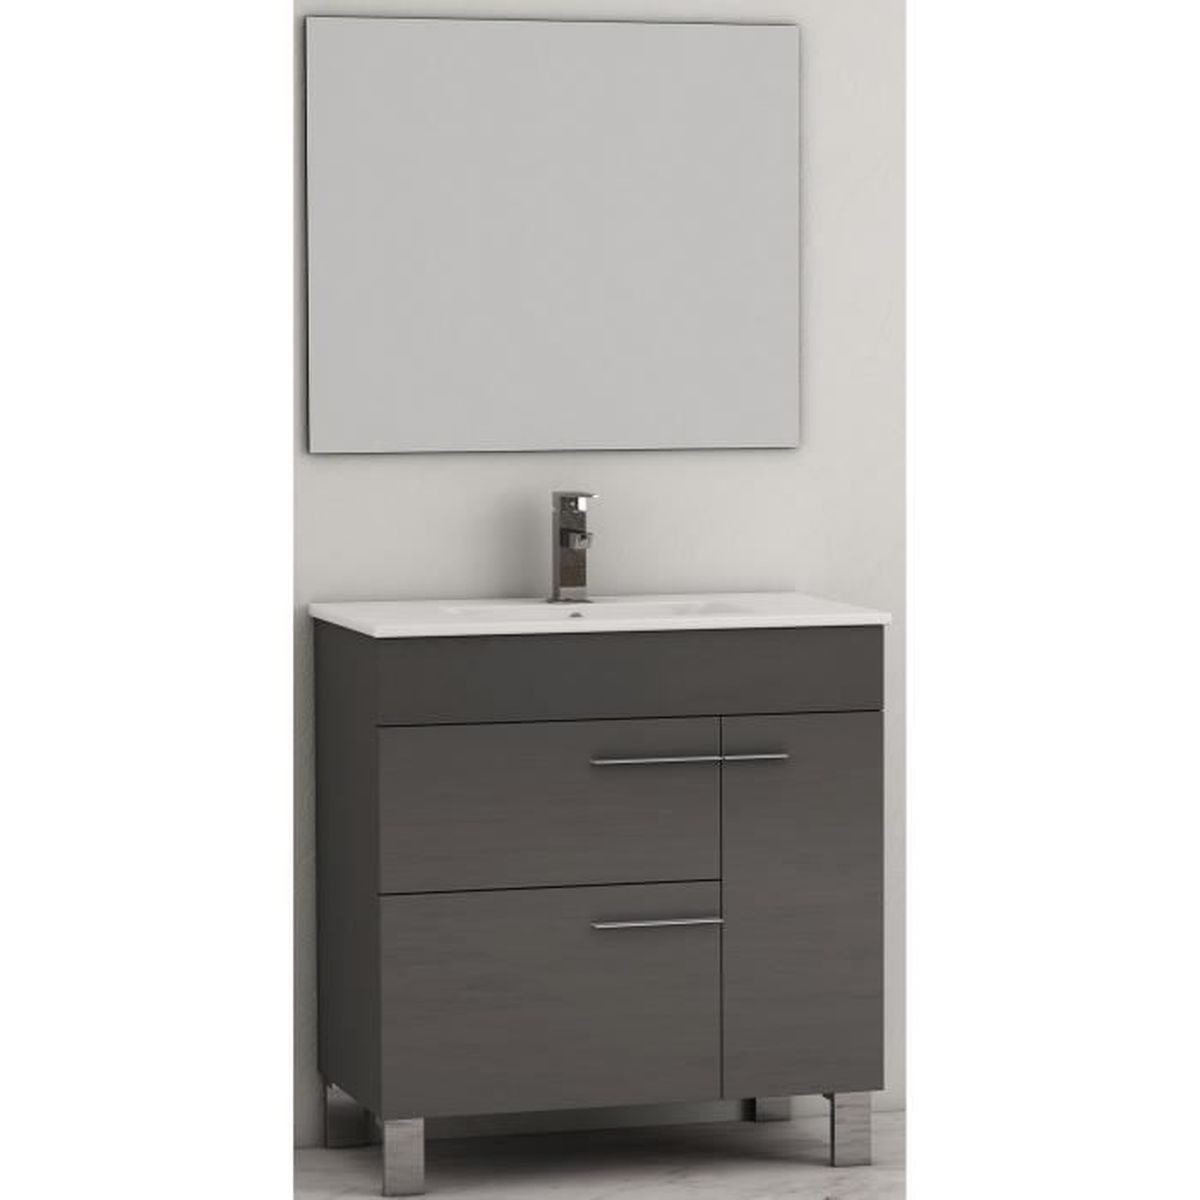 Meuble de salle de bains 2 tiroirs 1 porte mod le guapo for Achat porte meuble salle de bain